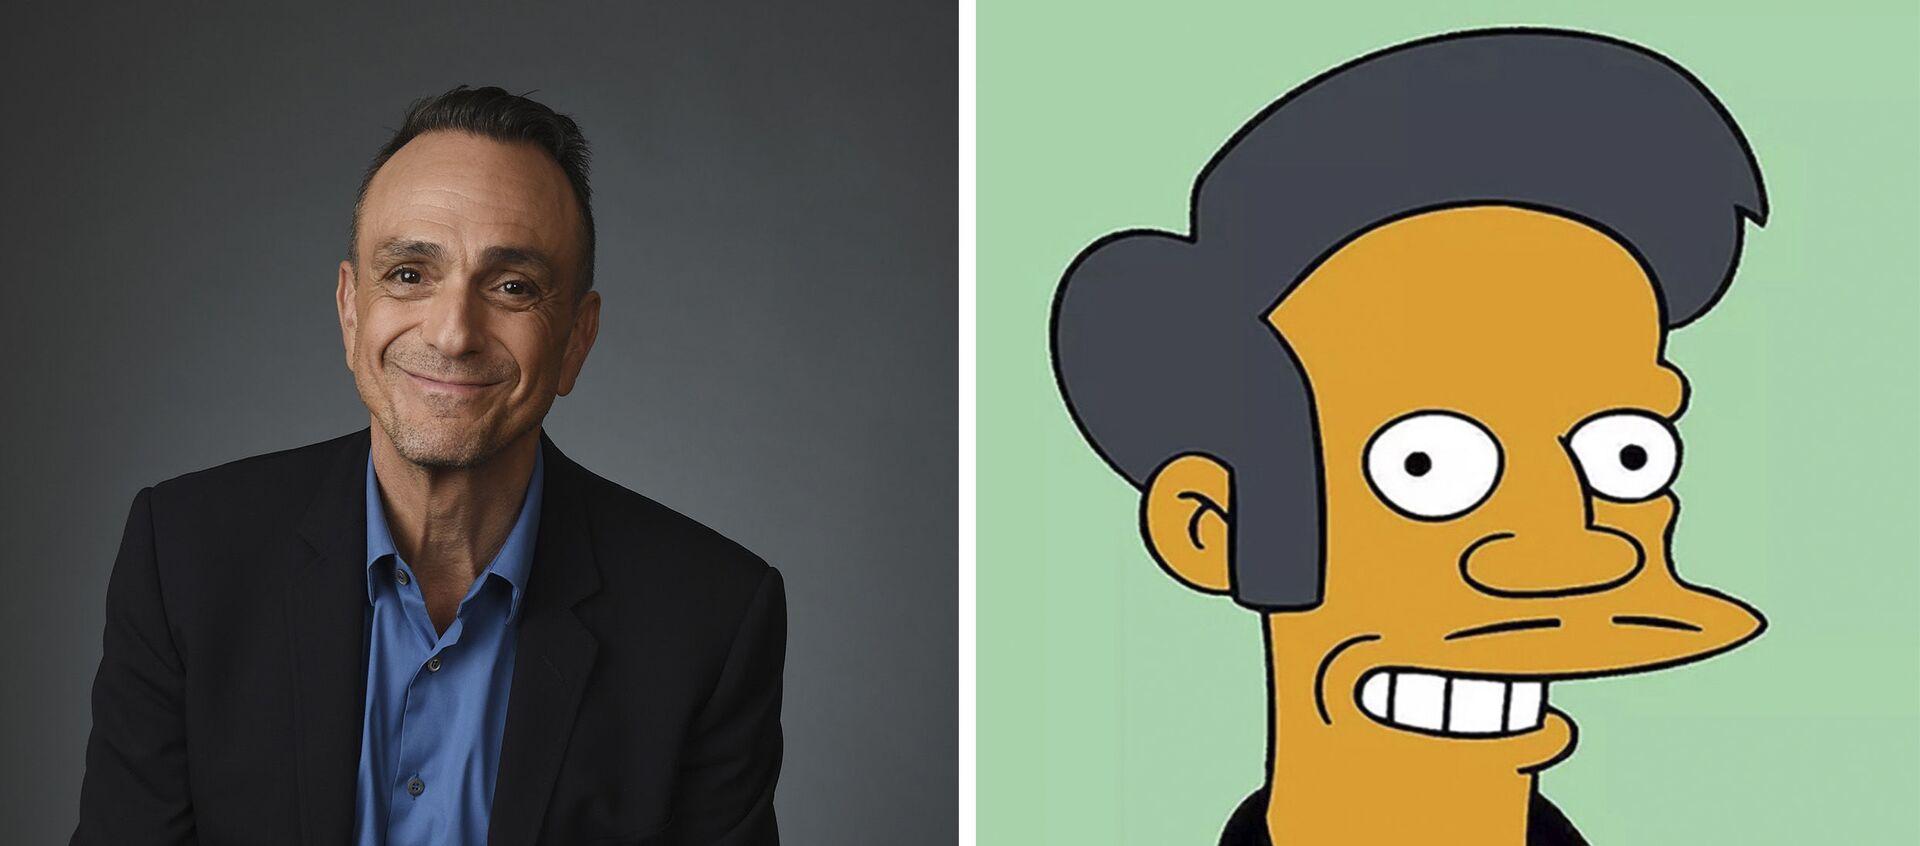 Herec Hank Azaria a postava ze seriálu Simpsonovi Apu Nahasapímapetilon - Sputnik Česká republika, 1920, 14.04.2021